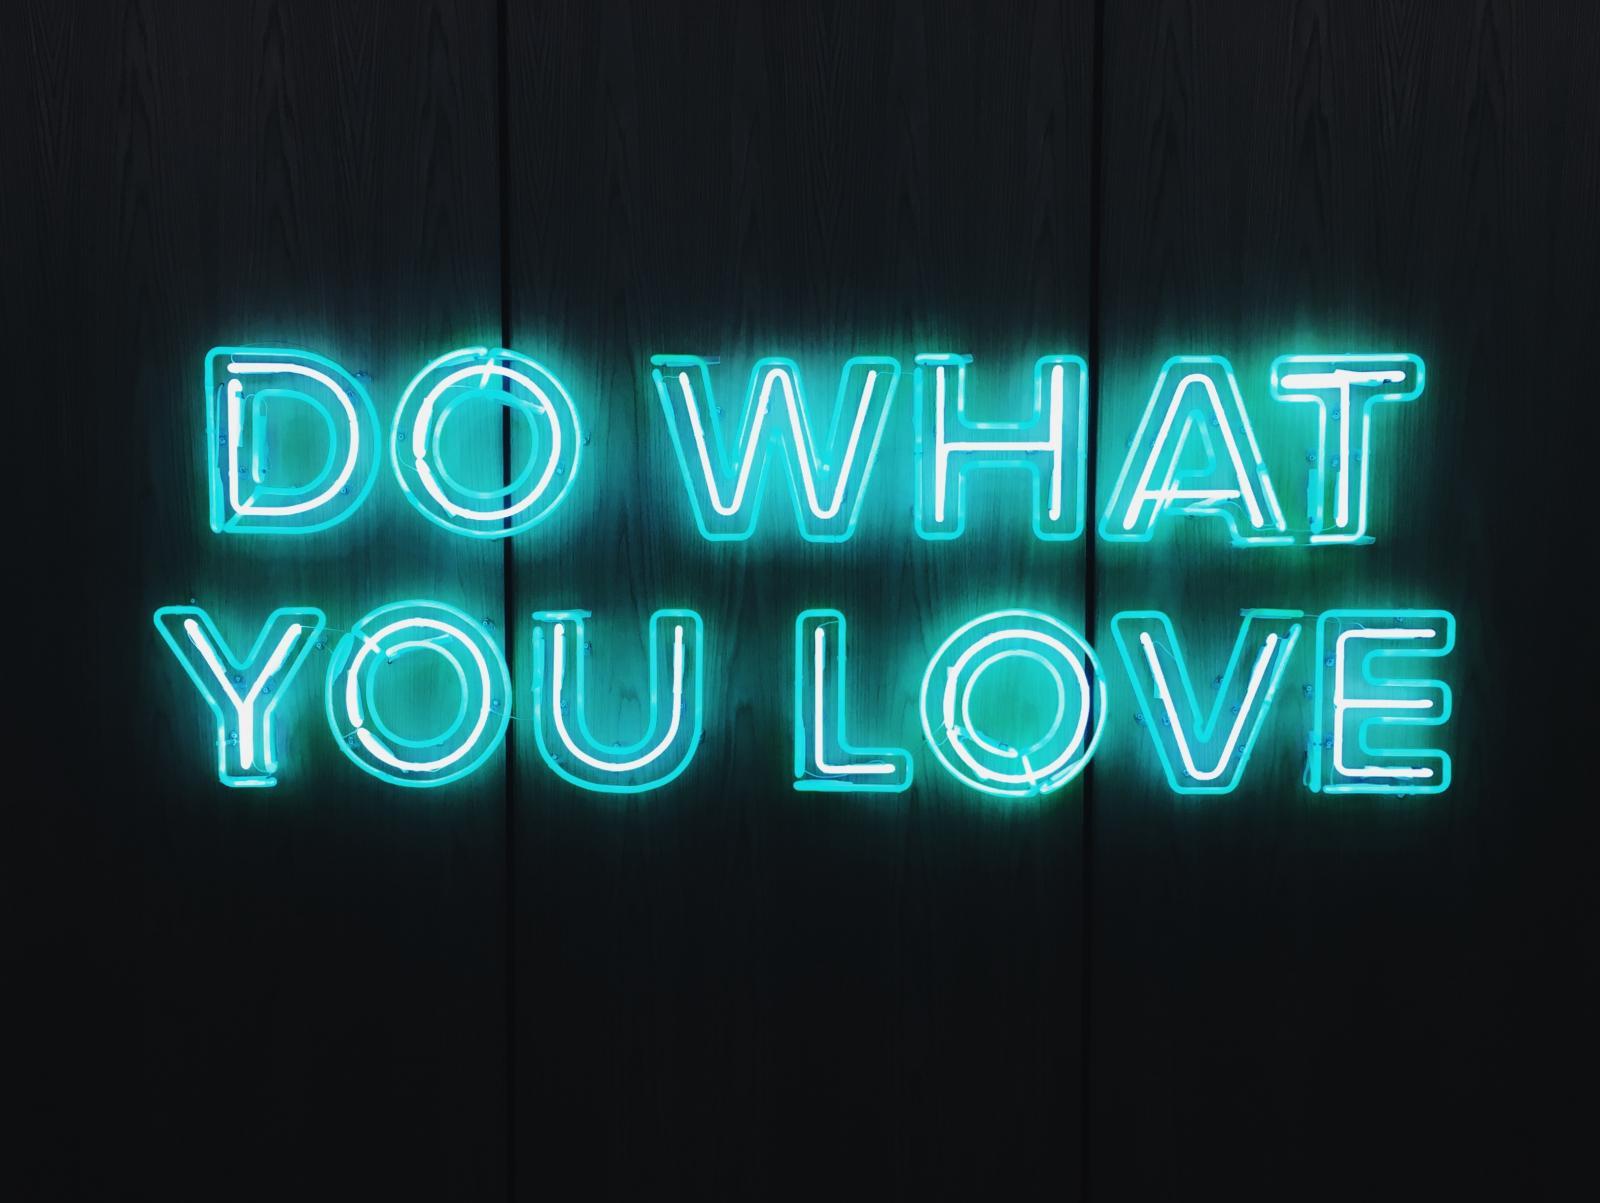 Photography image - Loading Do_What_You_Love_Sign_sean-kowal-IbngTBpNuMA-unsplash.jpg